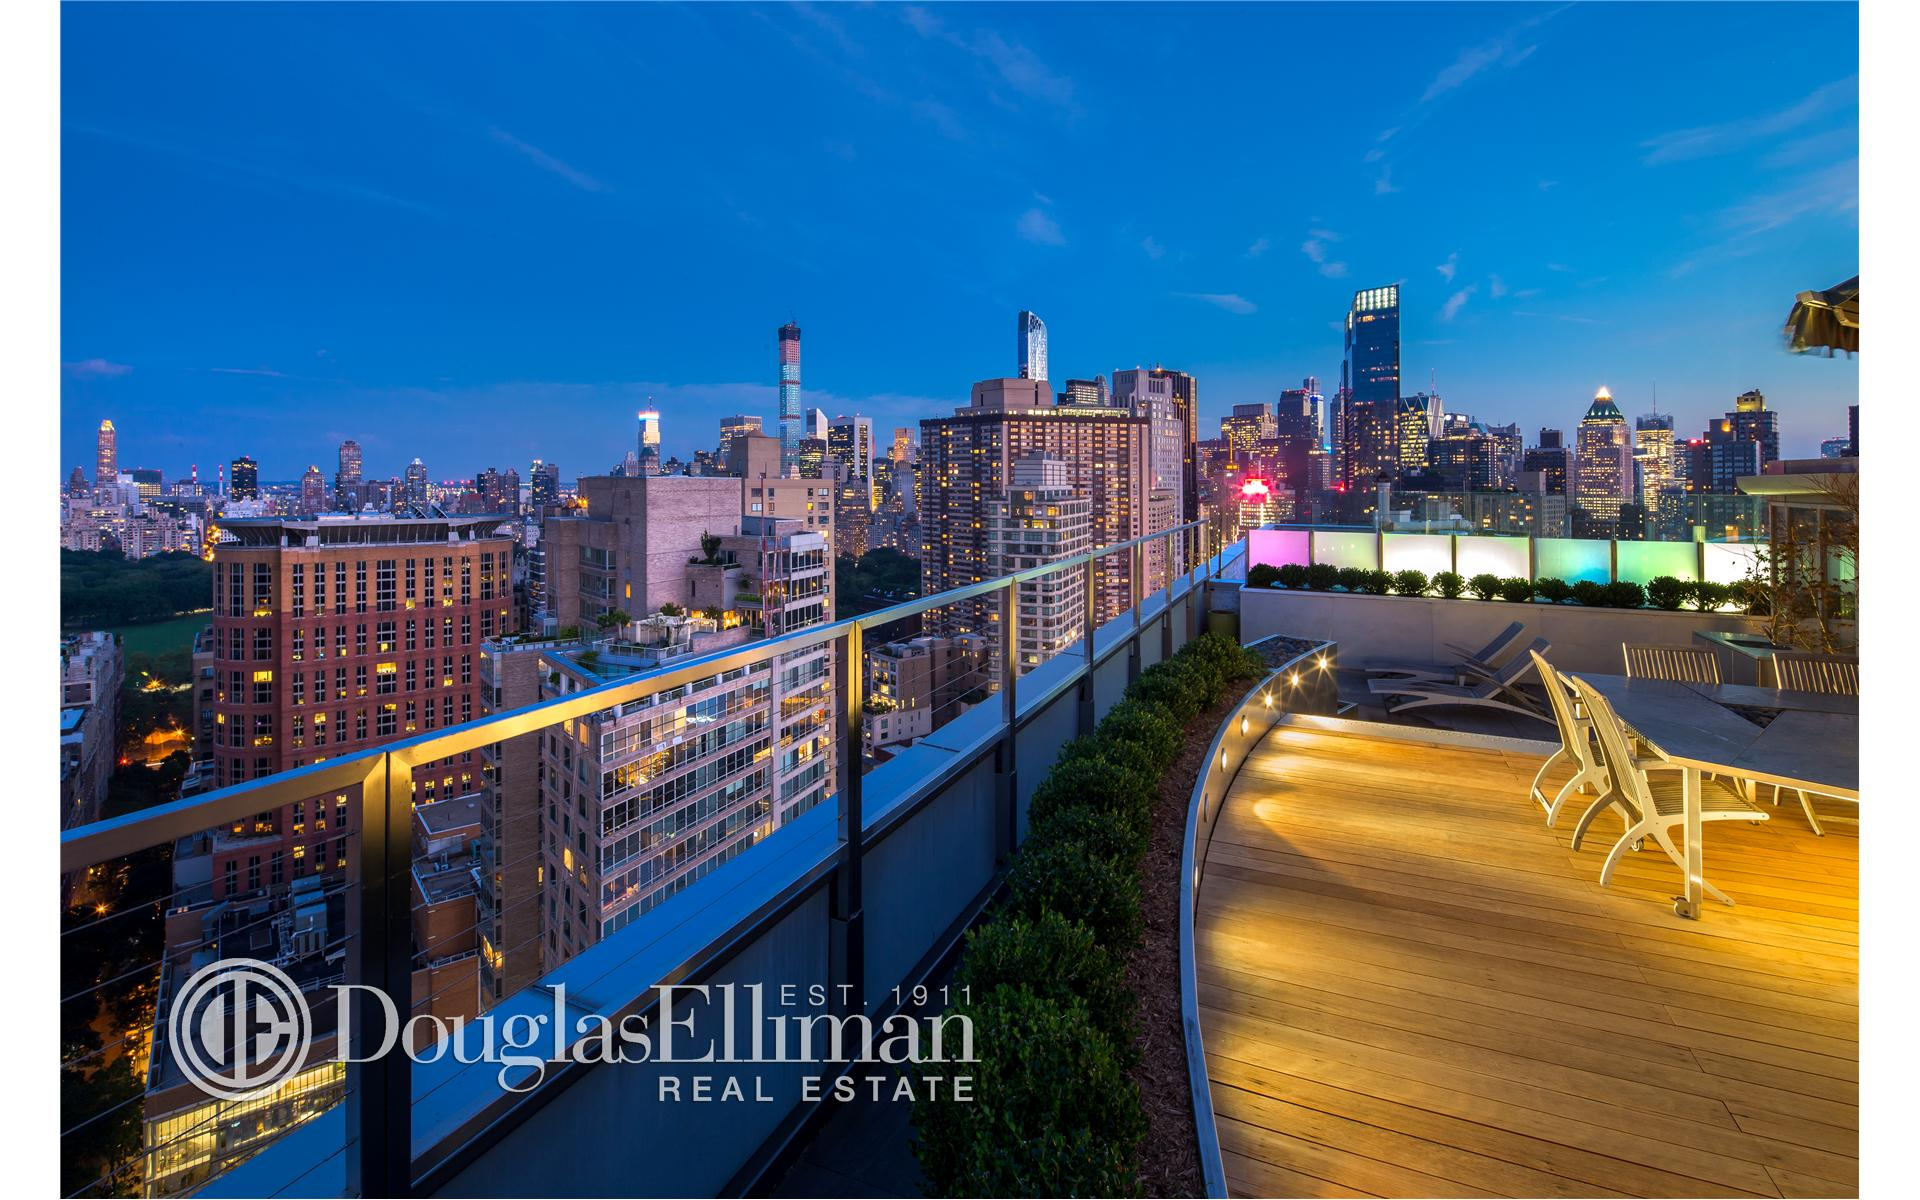 Condominium for Sale at GRAND MILLENNIUM, Grand Millennium, 1965 Broadway New York, New York 10023 United States